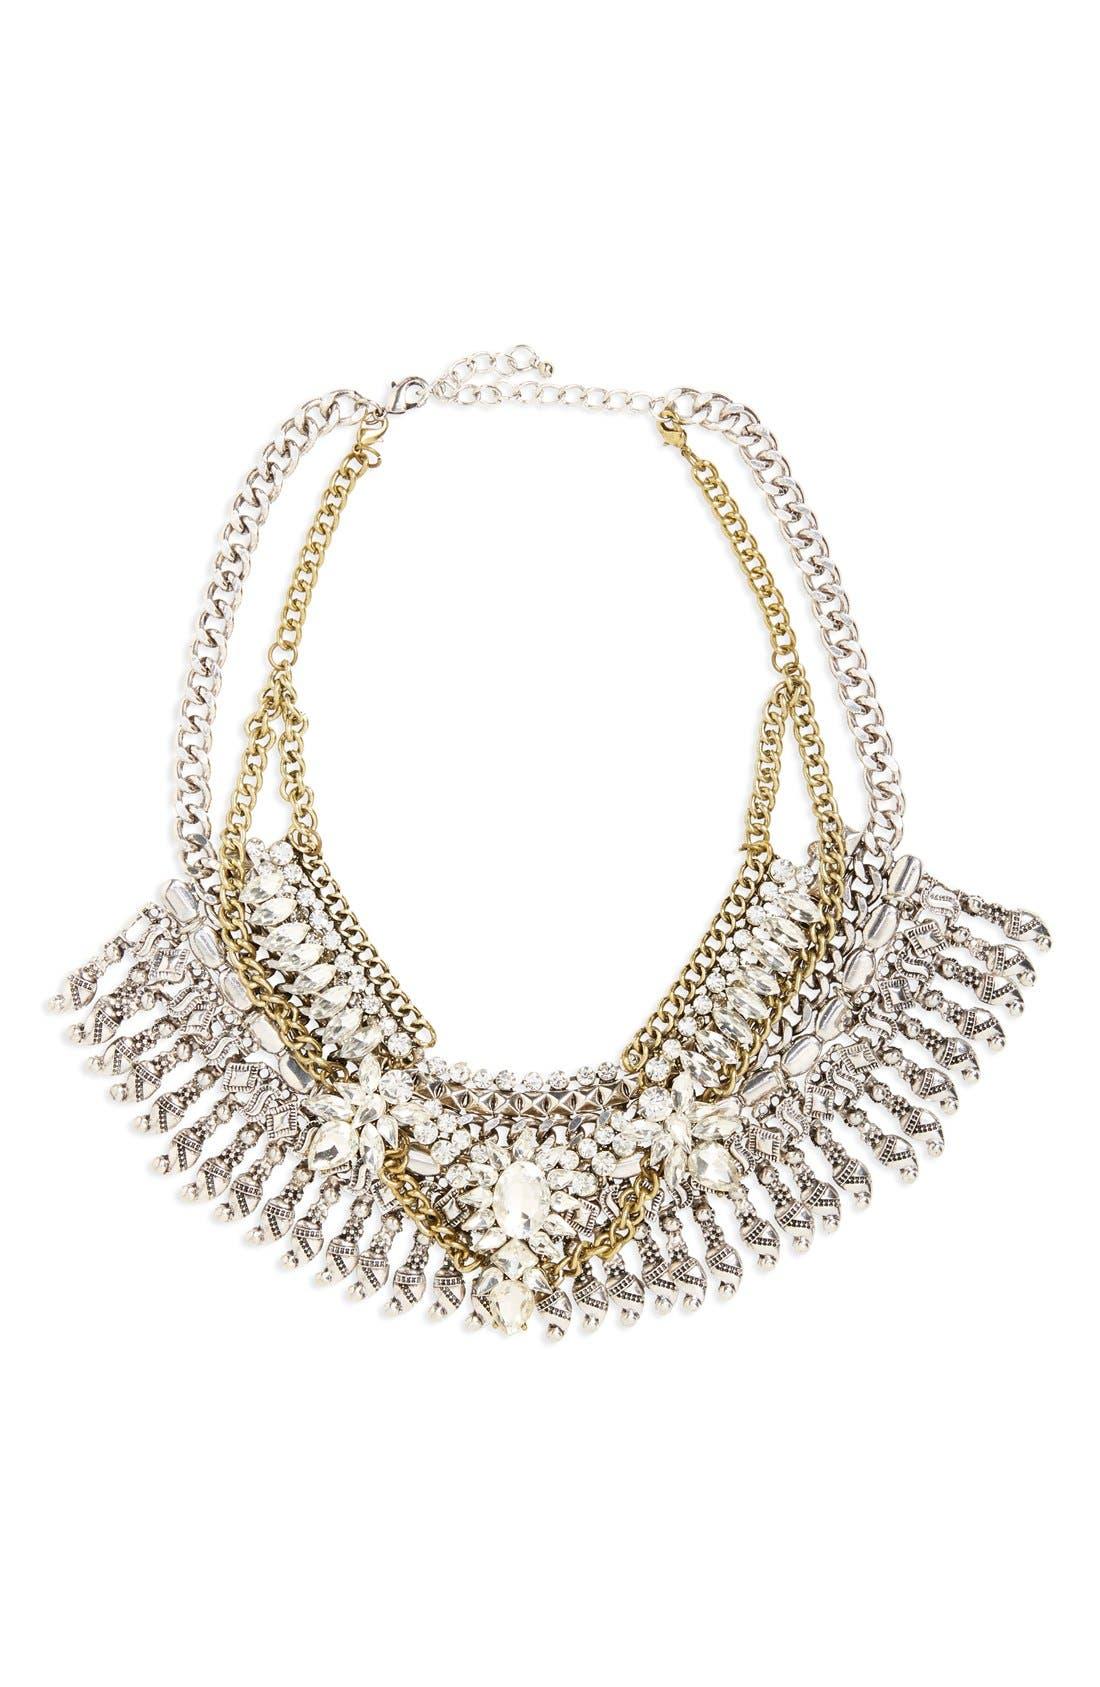 Main Image - Leith Crystal & Fringe Layered Statement Necklace